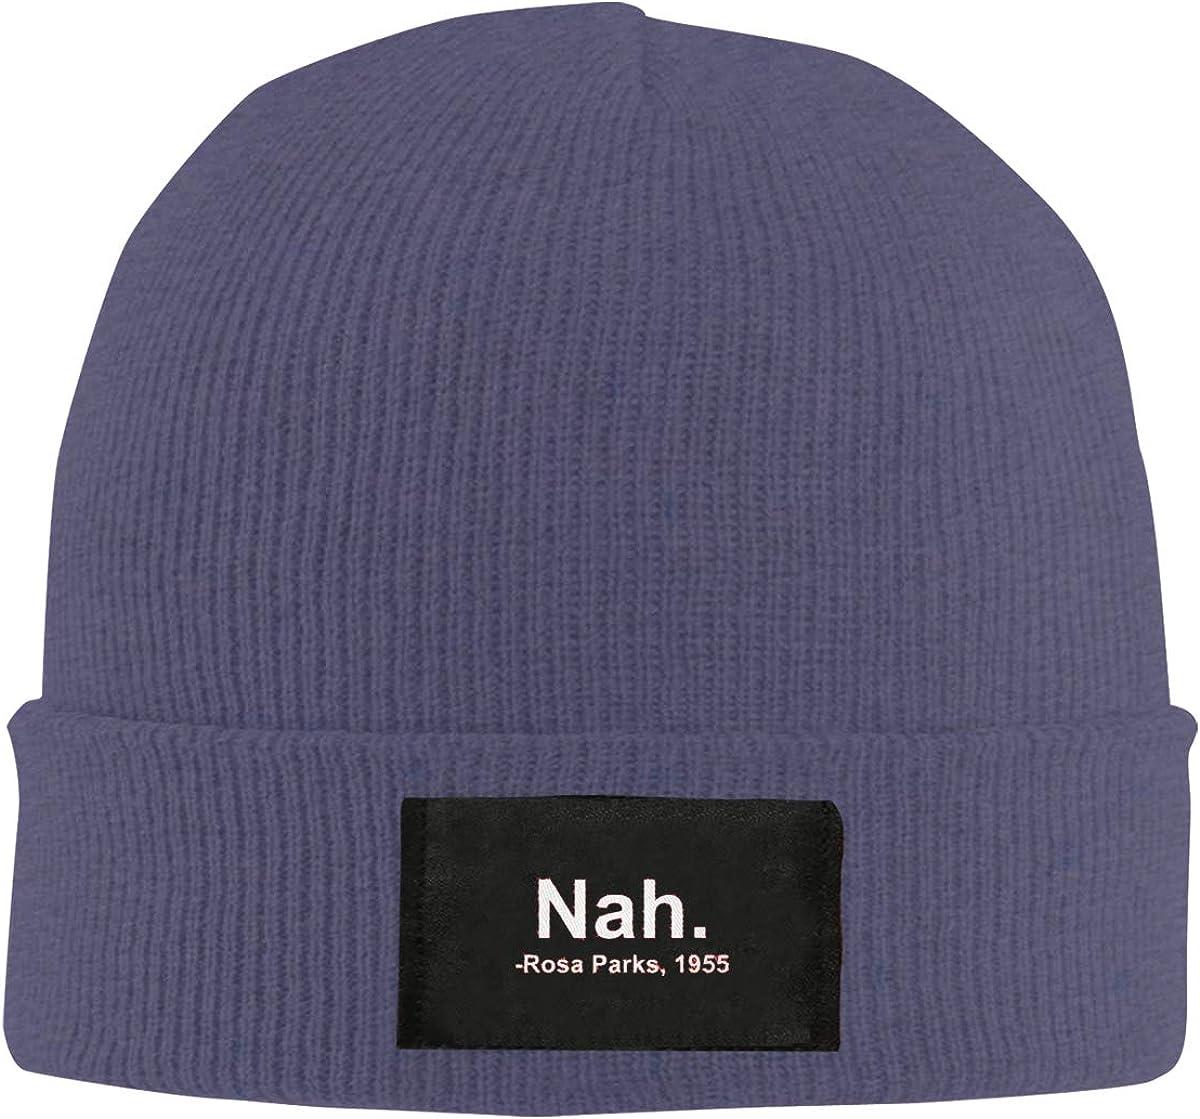 Unisex Stylish Slouch Beanie Hats Black Nah Rosa Park Top Level Beanie Men Women